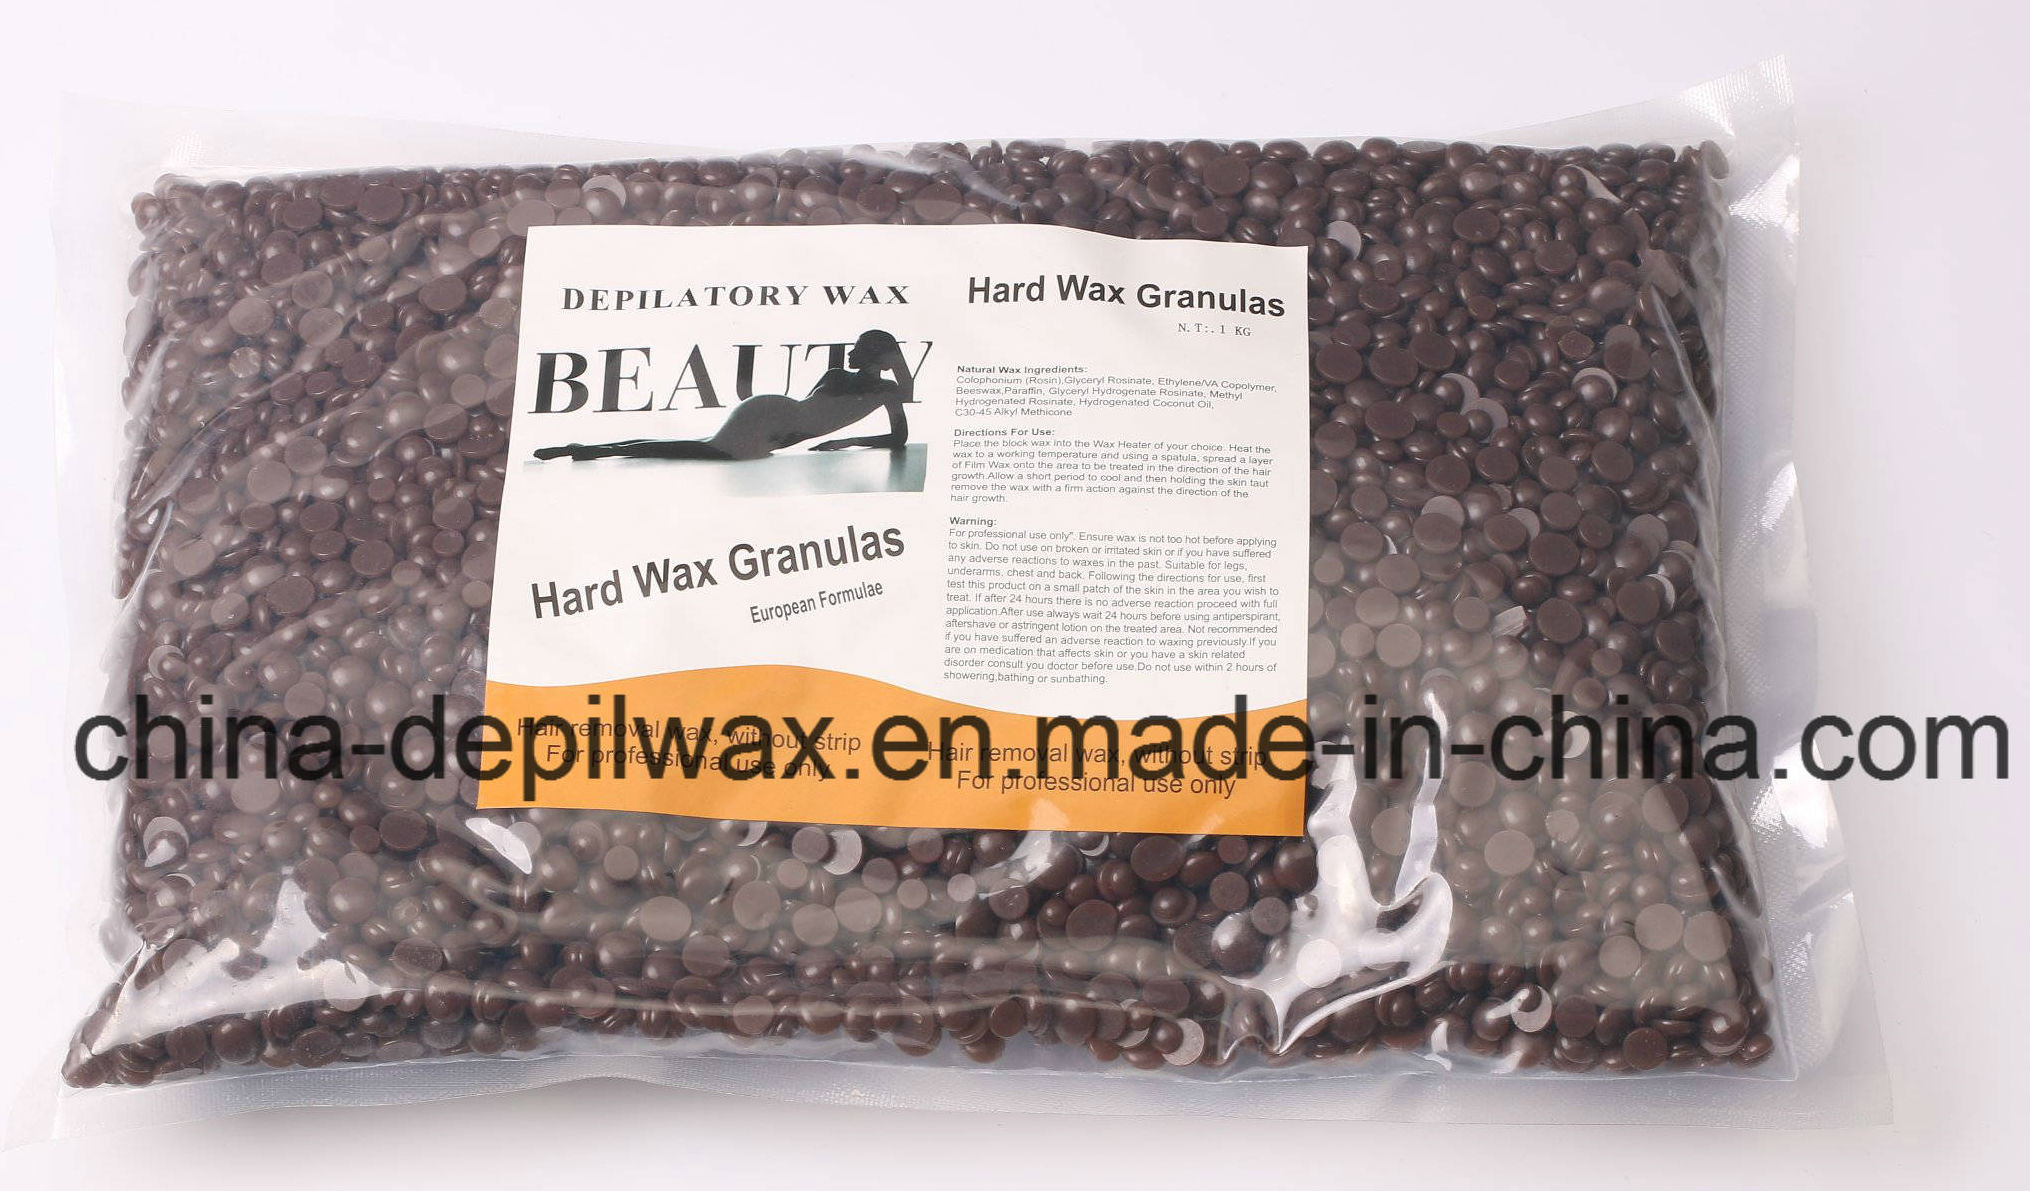 Natural Honey Hard Wax Pellets Depilatory Wax for Brazilian Waxing